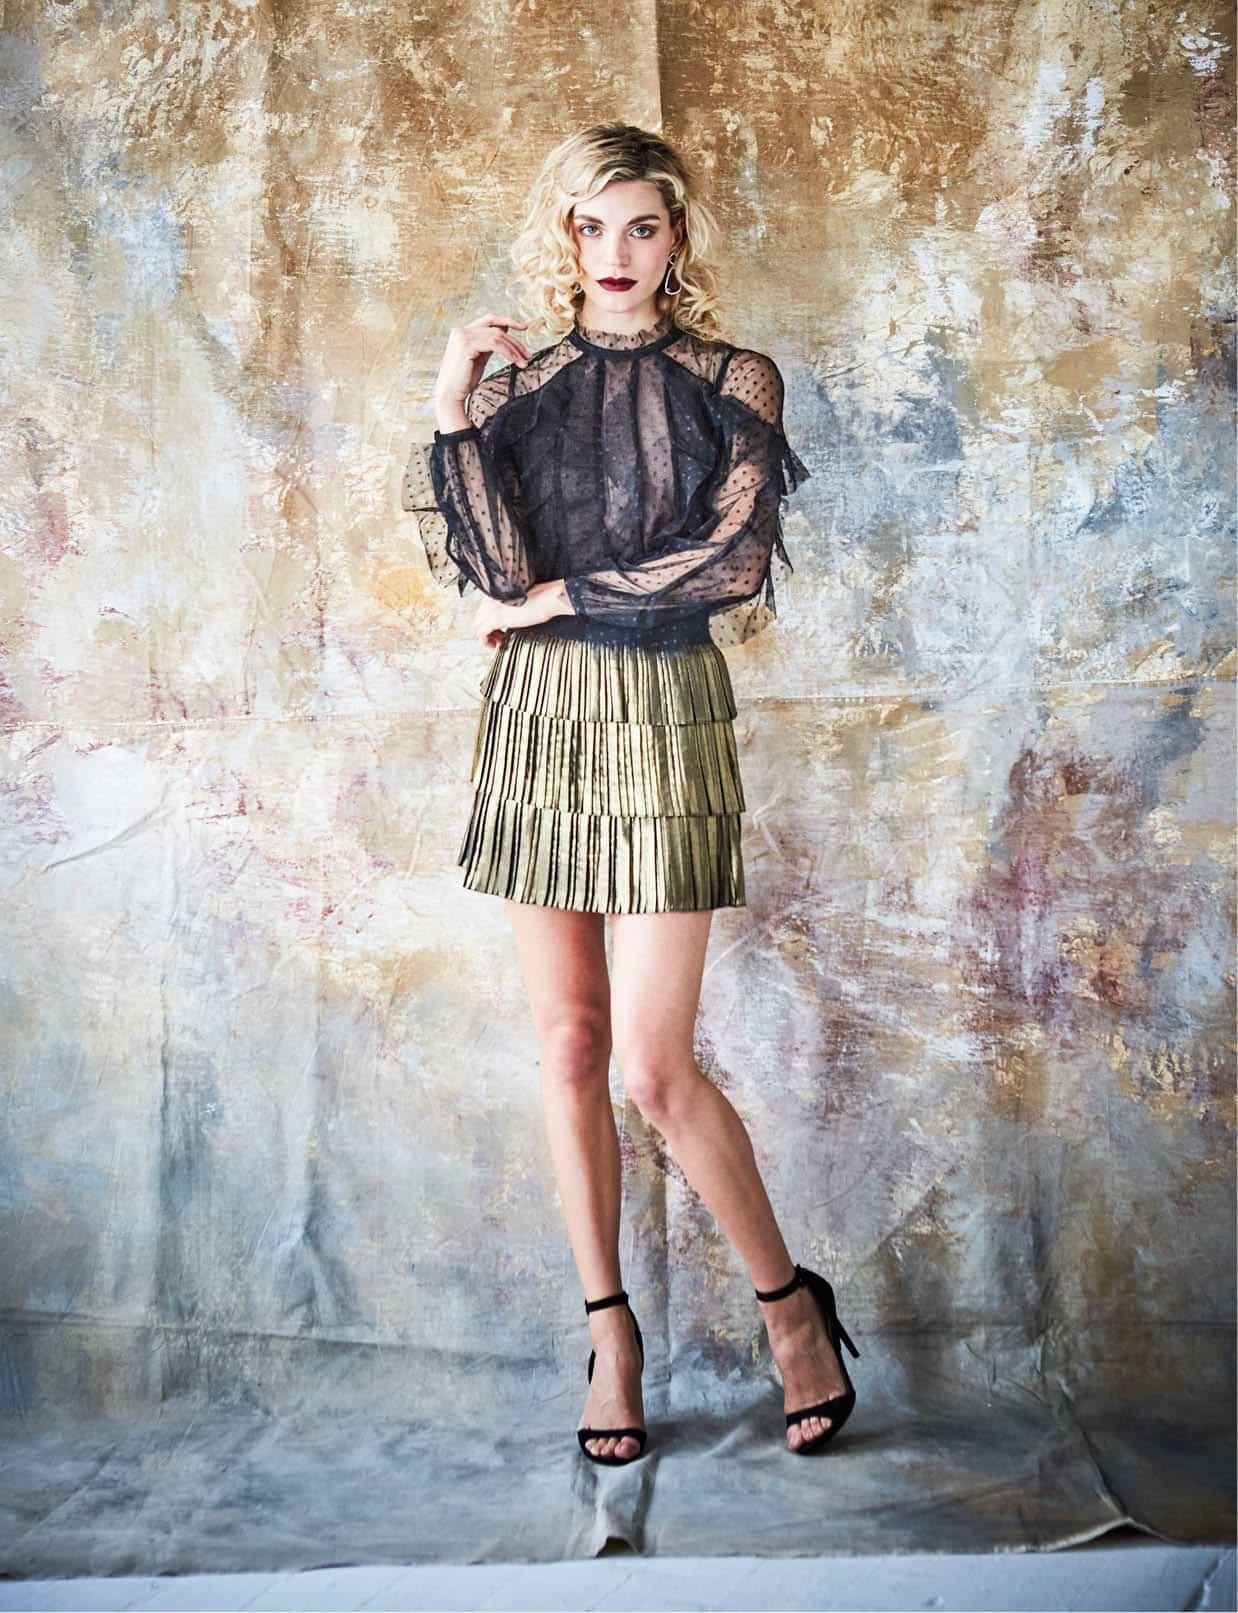 BCBG Max Azria Leora top, $228, Belk. BCBG Max Azria Zana skirt, $158, Belk. Carolee earrings, $75, Belk. Model's own shoes.